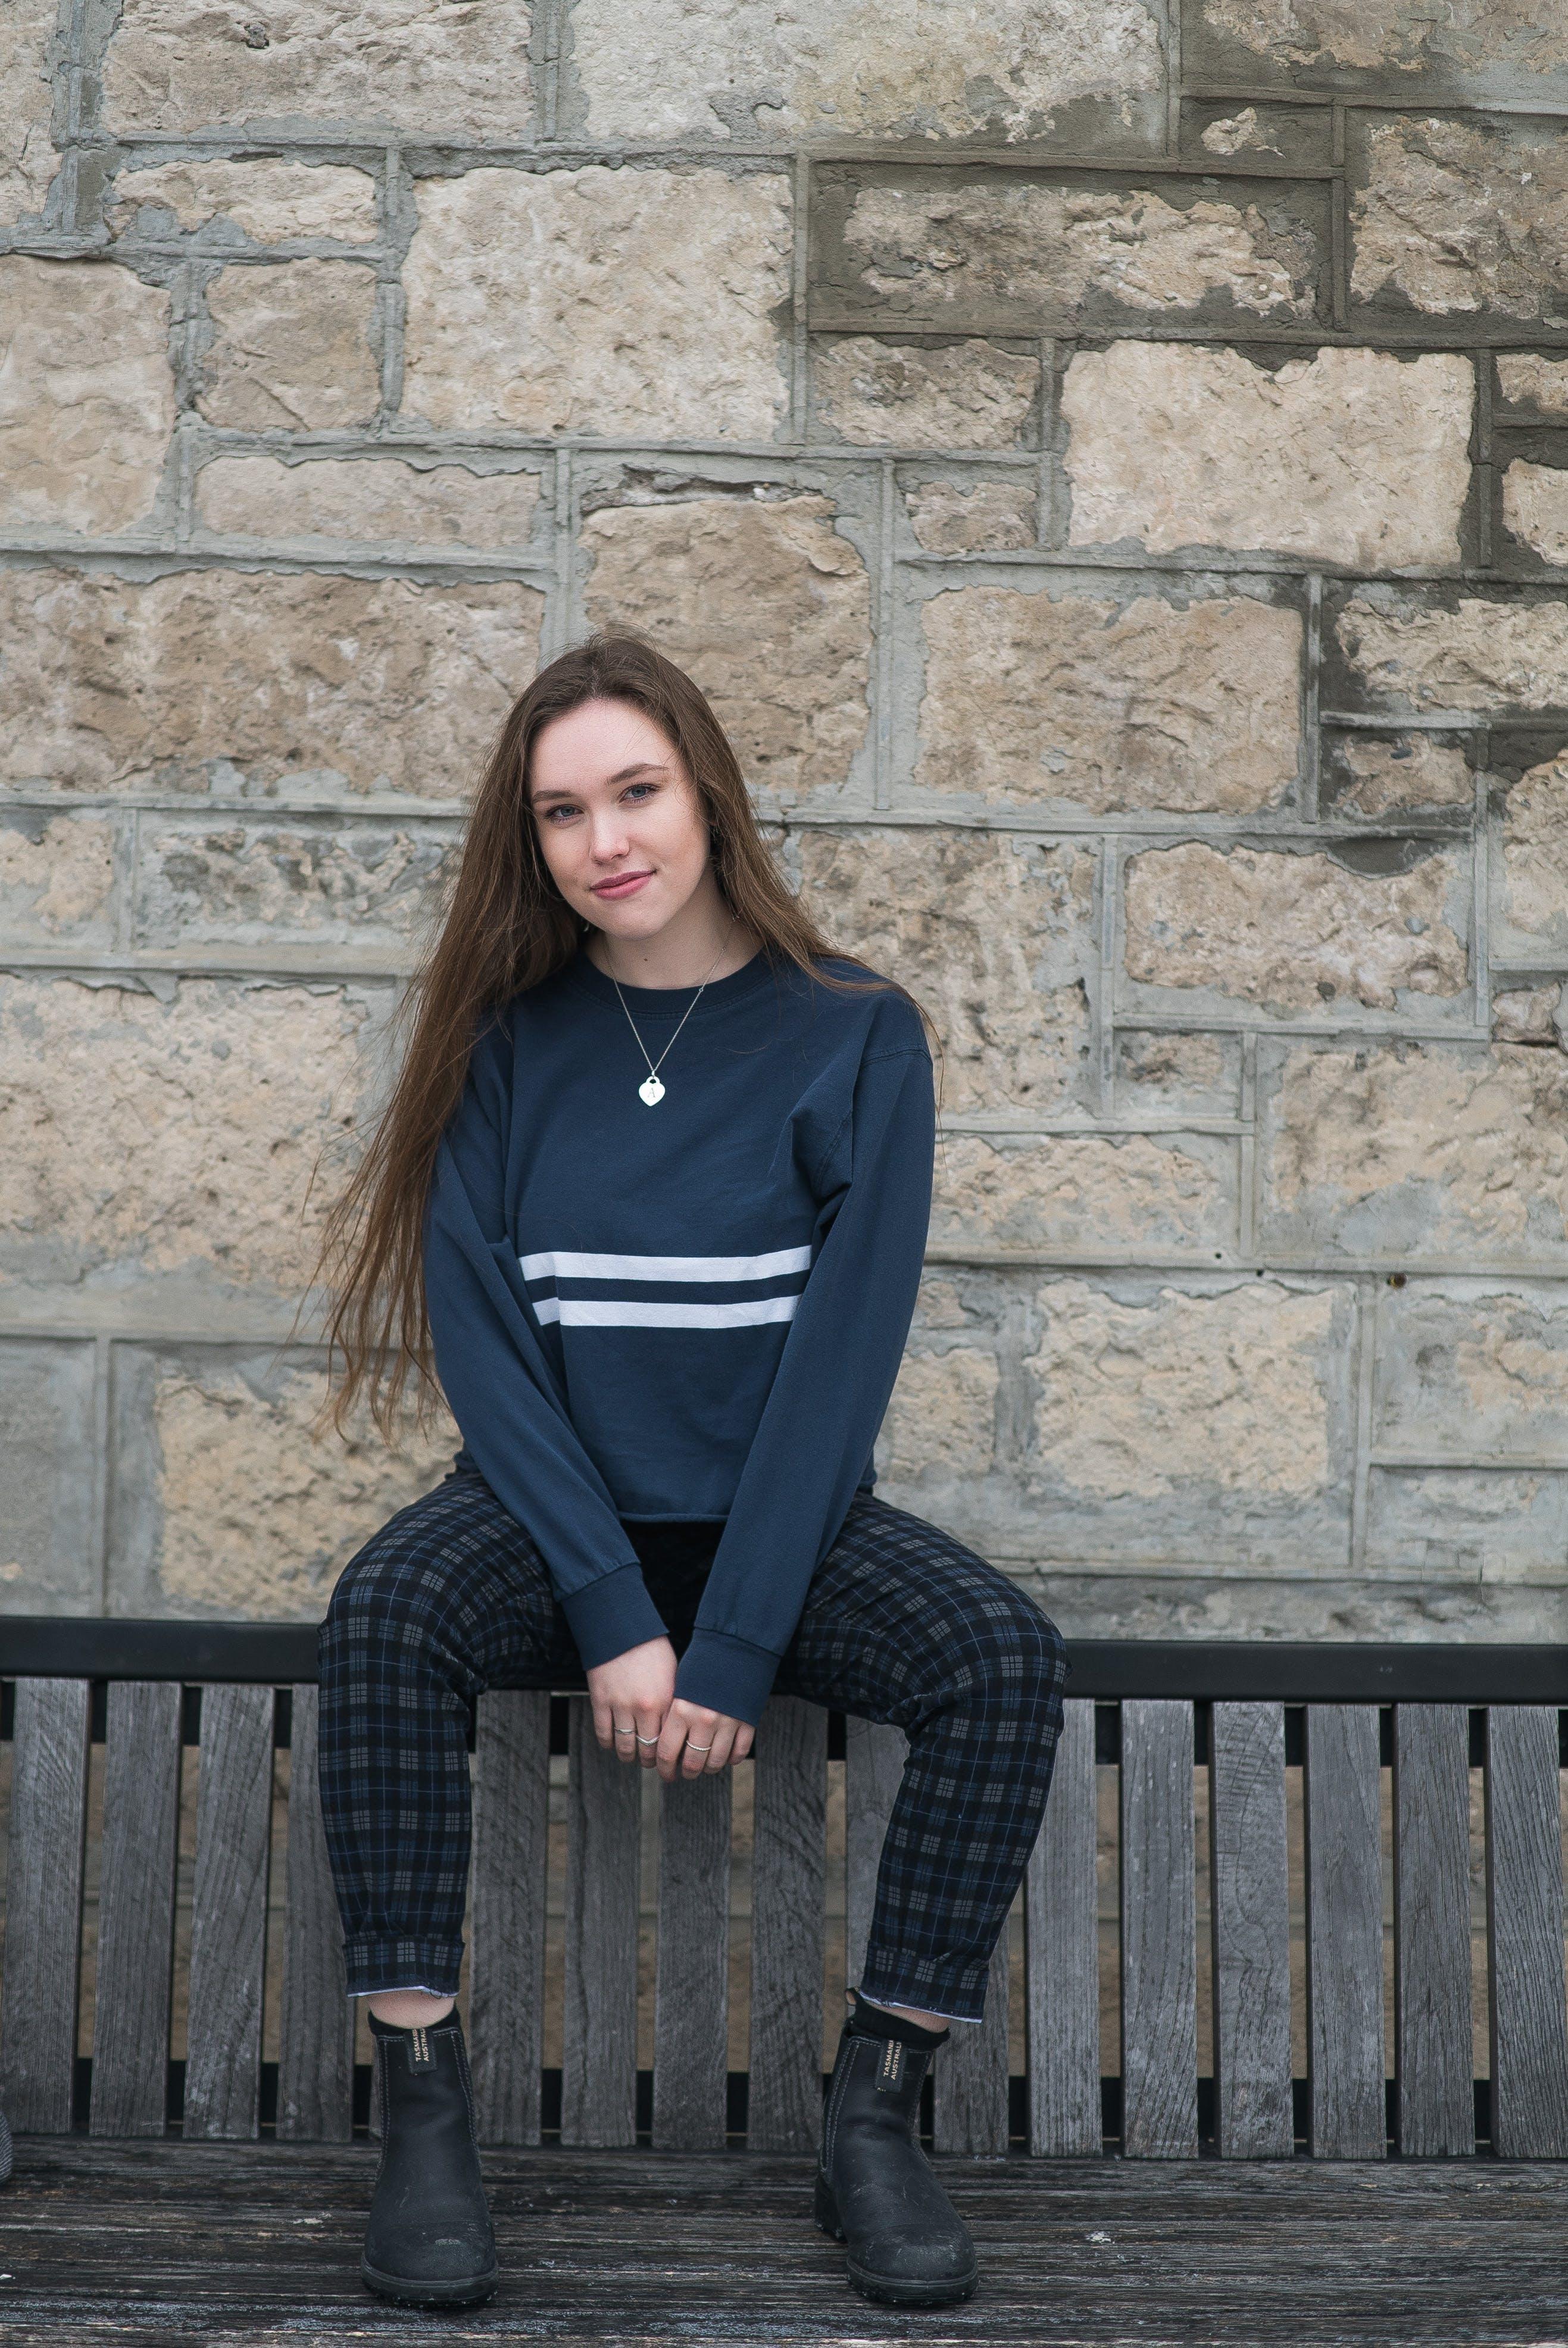 Girl Wearing Blue Sweater Sitting On Bench